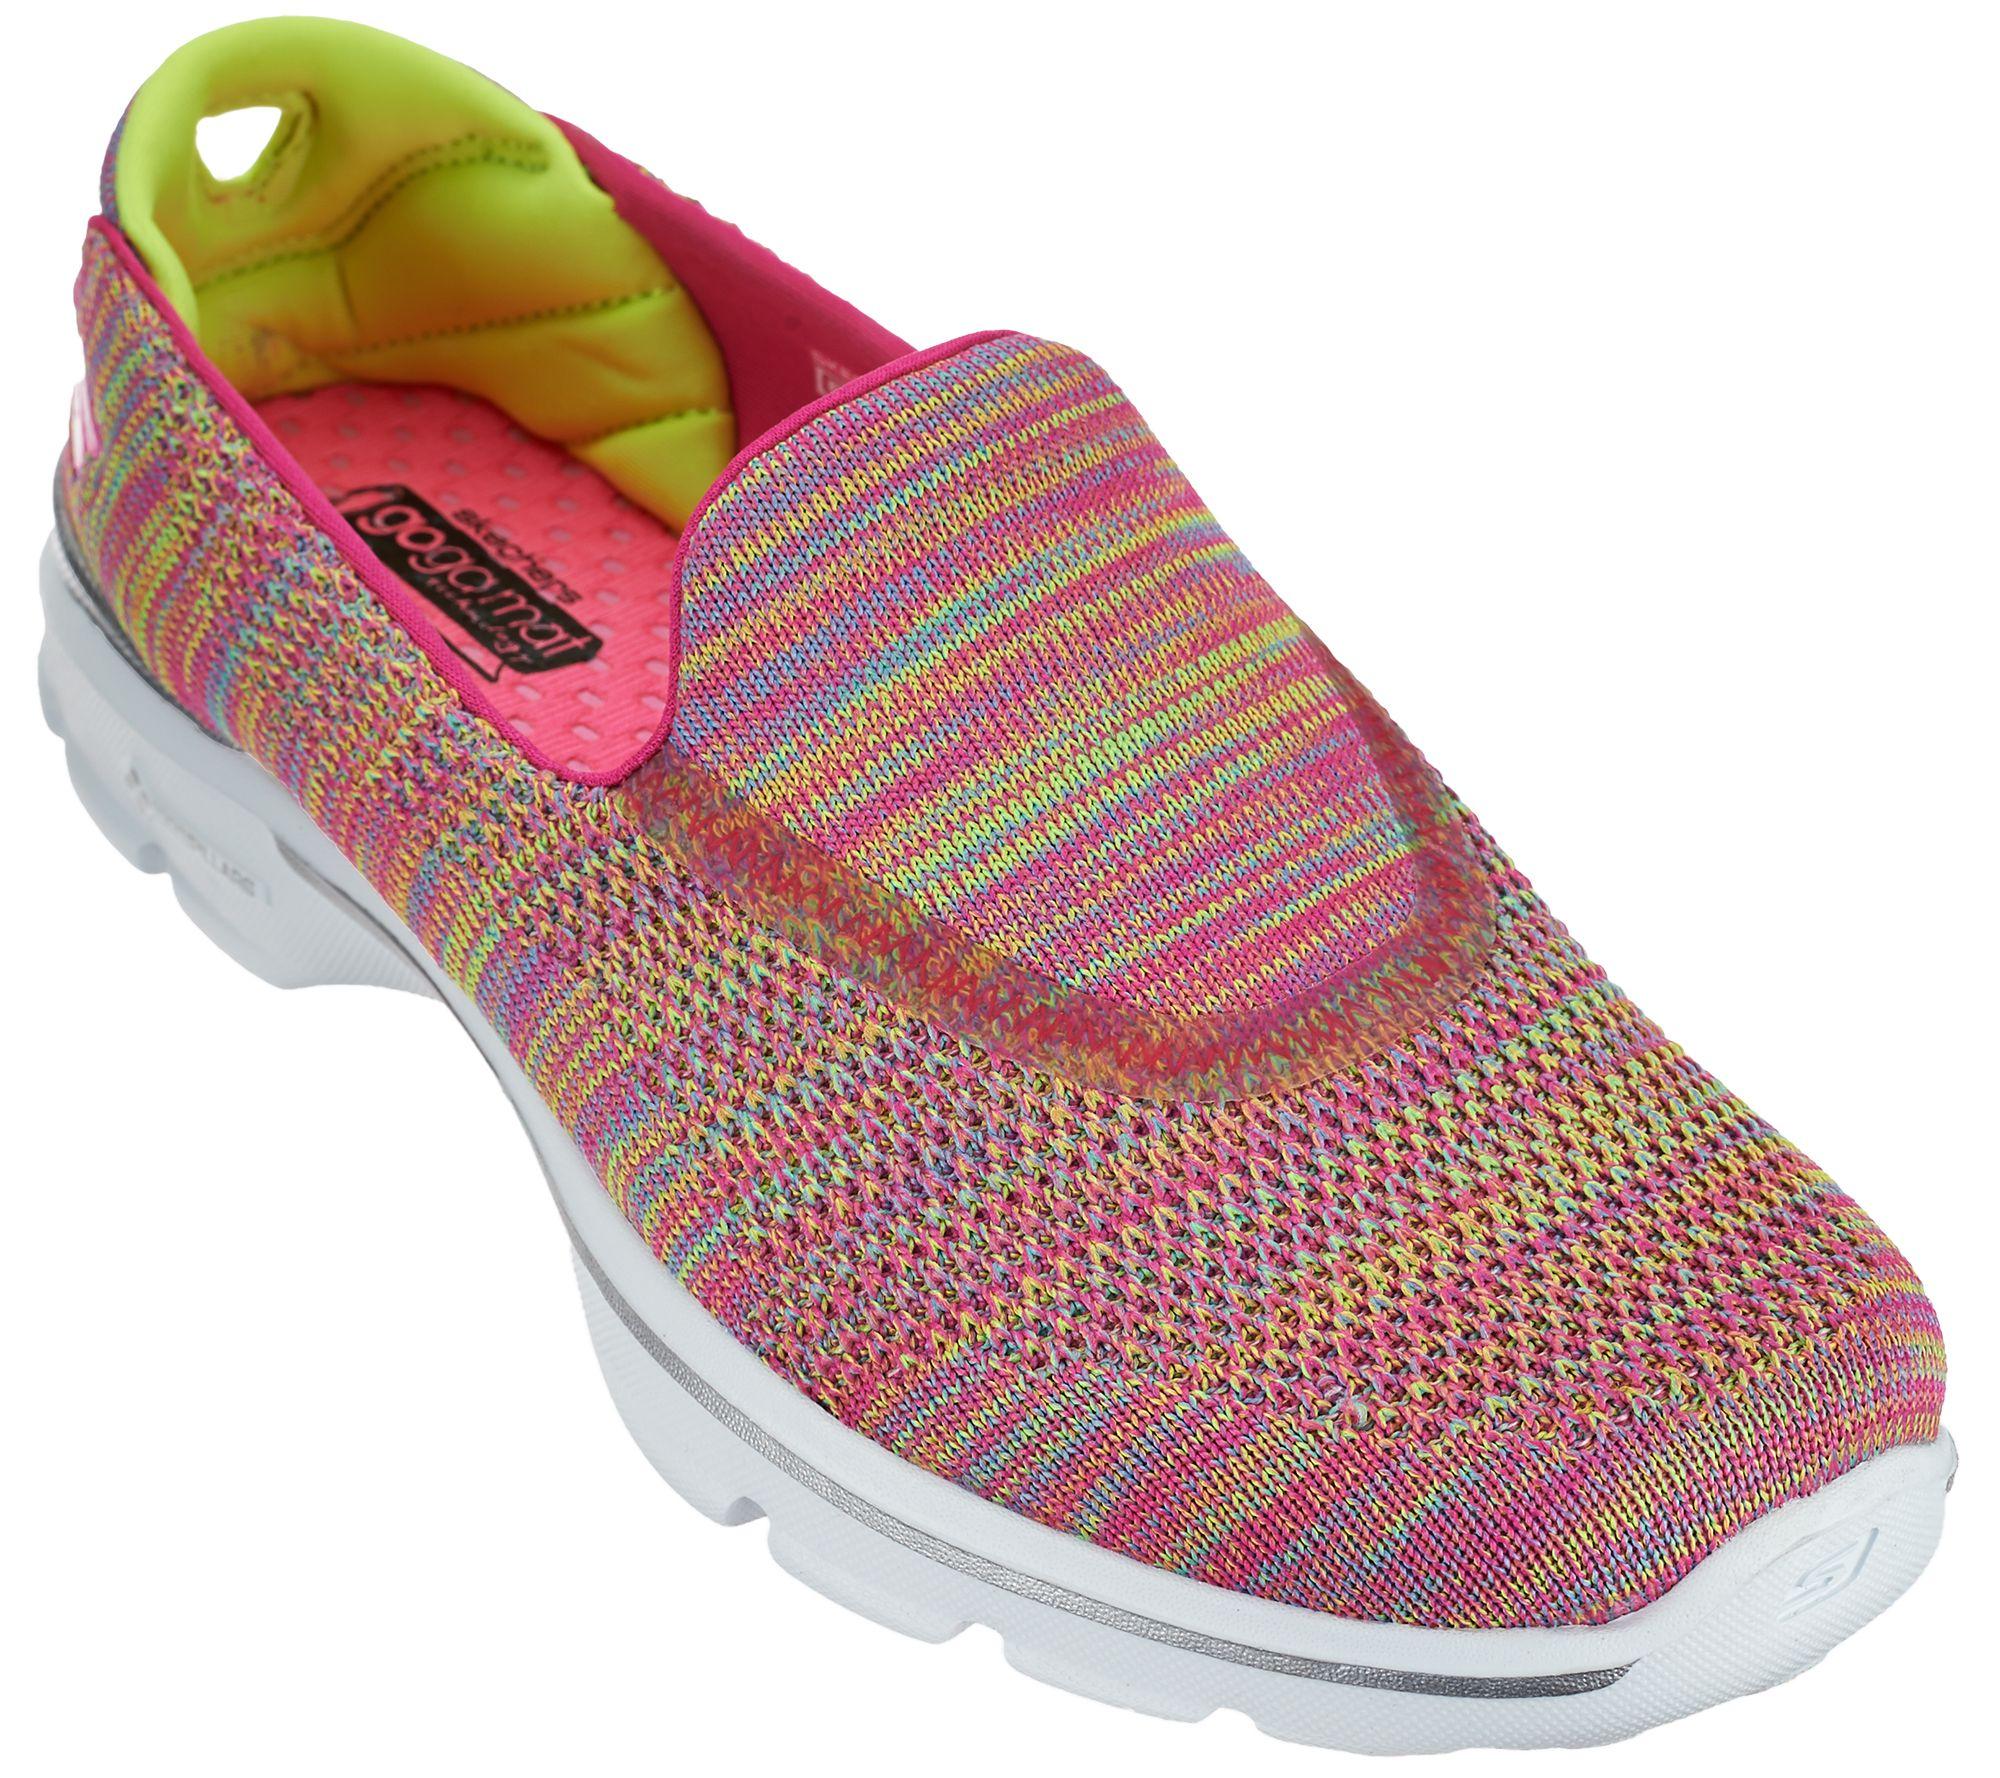 e98a618a0eff Skechers Gowalk 3 Fitknit Slip-on Sneakers - Tilt - Page 1 — QVC.com